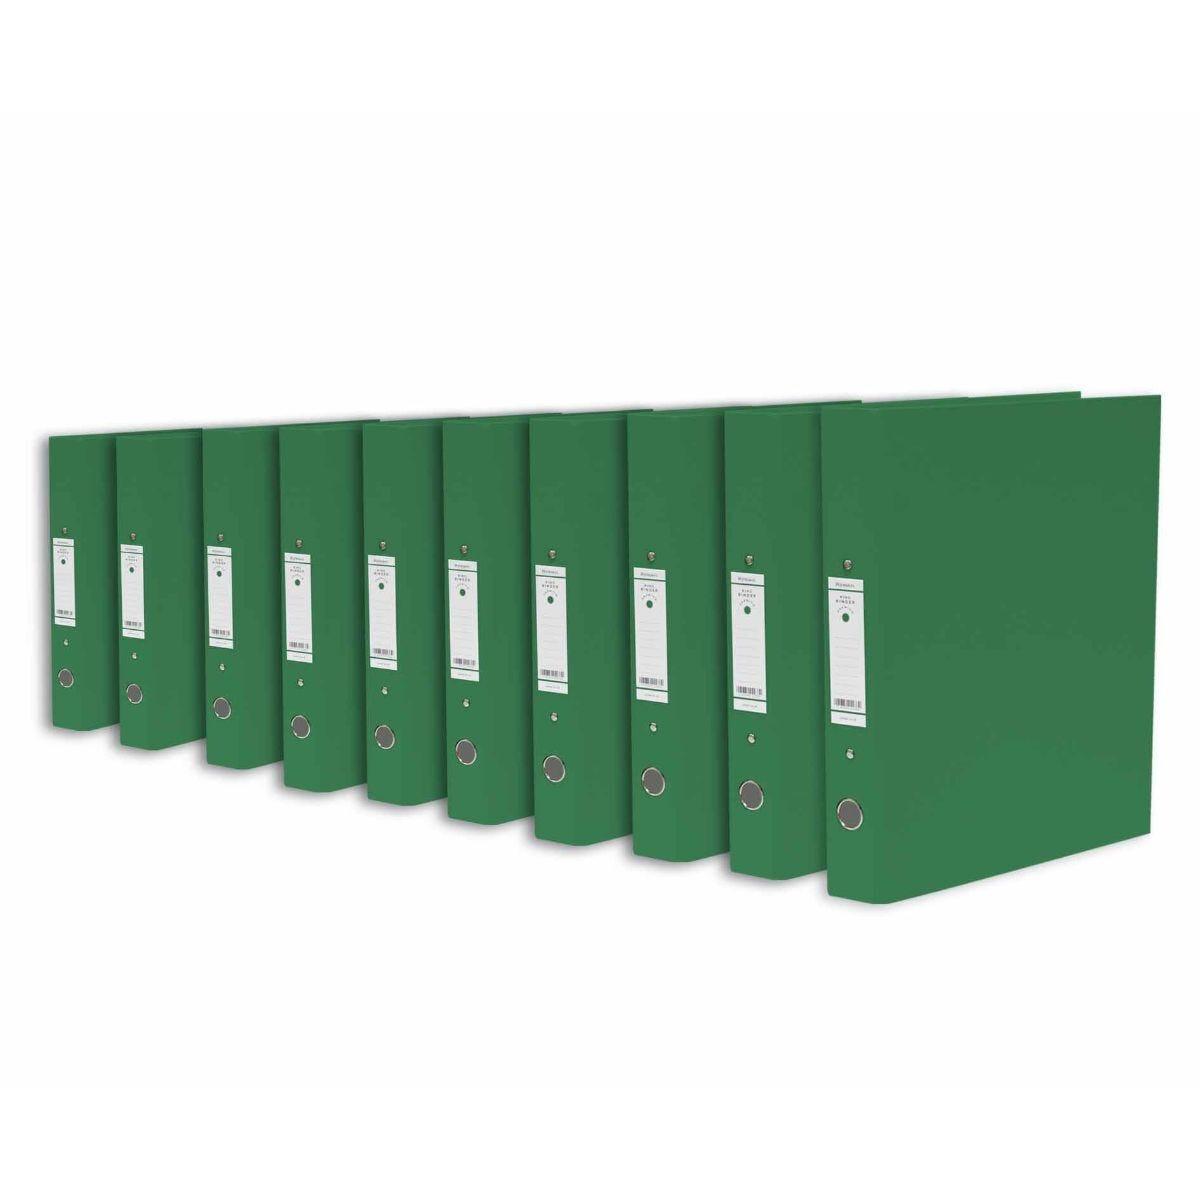 Ryman Premium Ring Binder Pack of 10 Dark Green